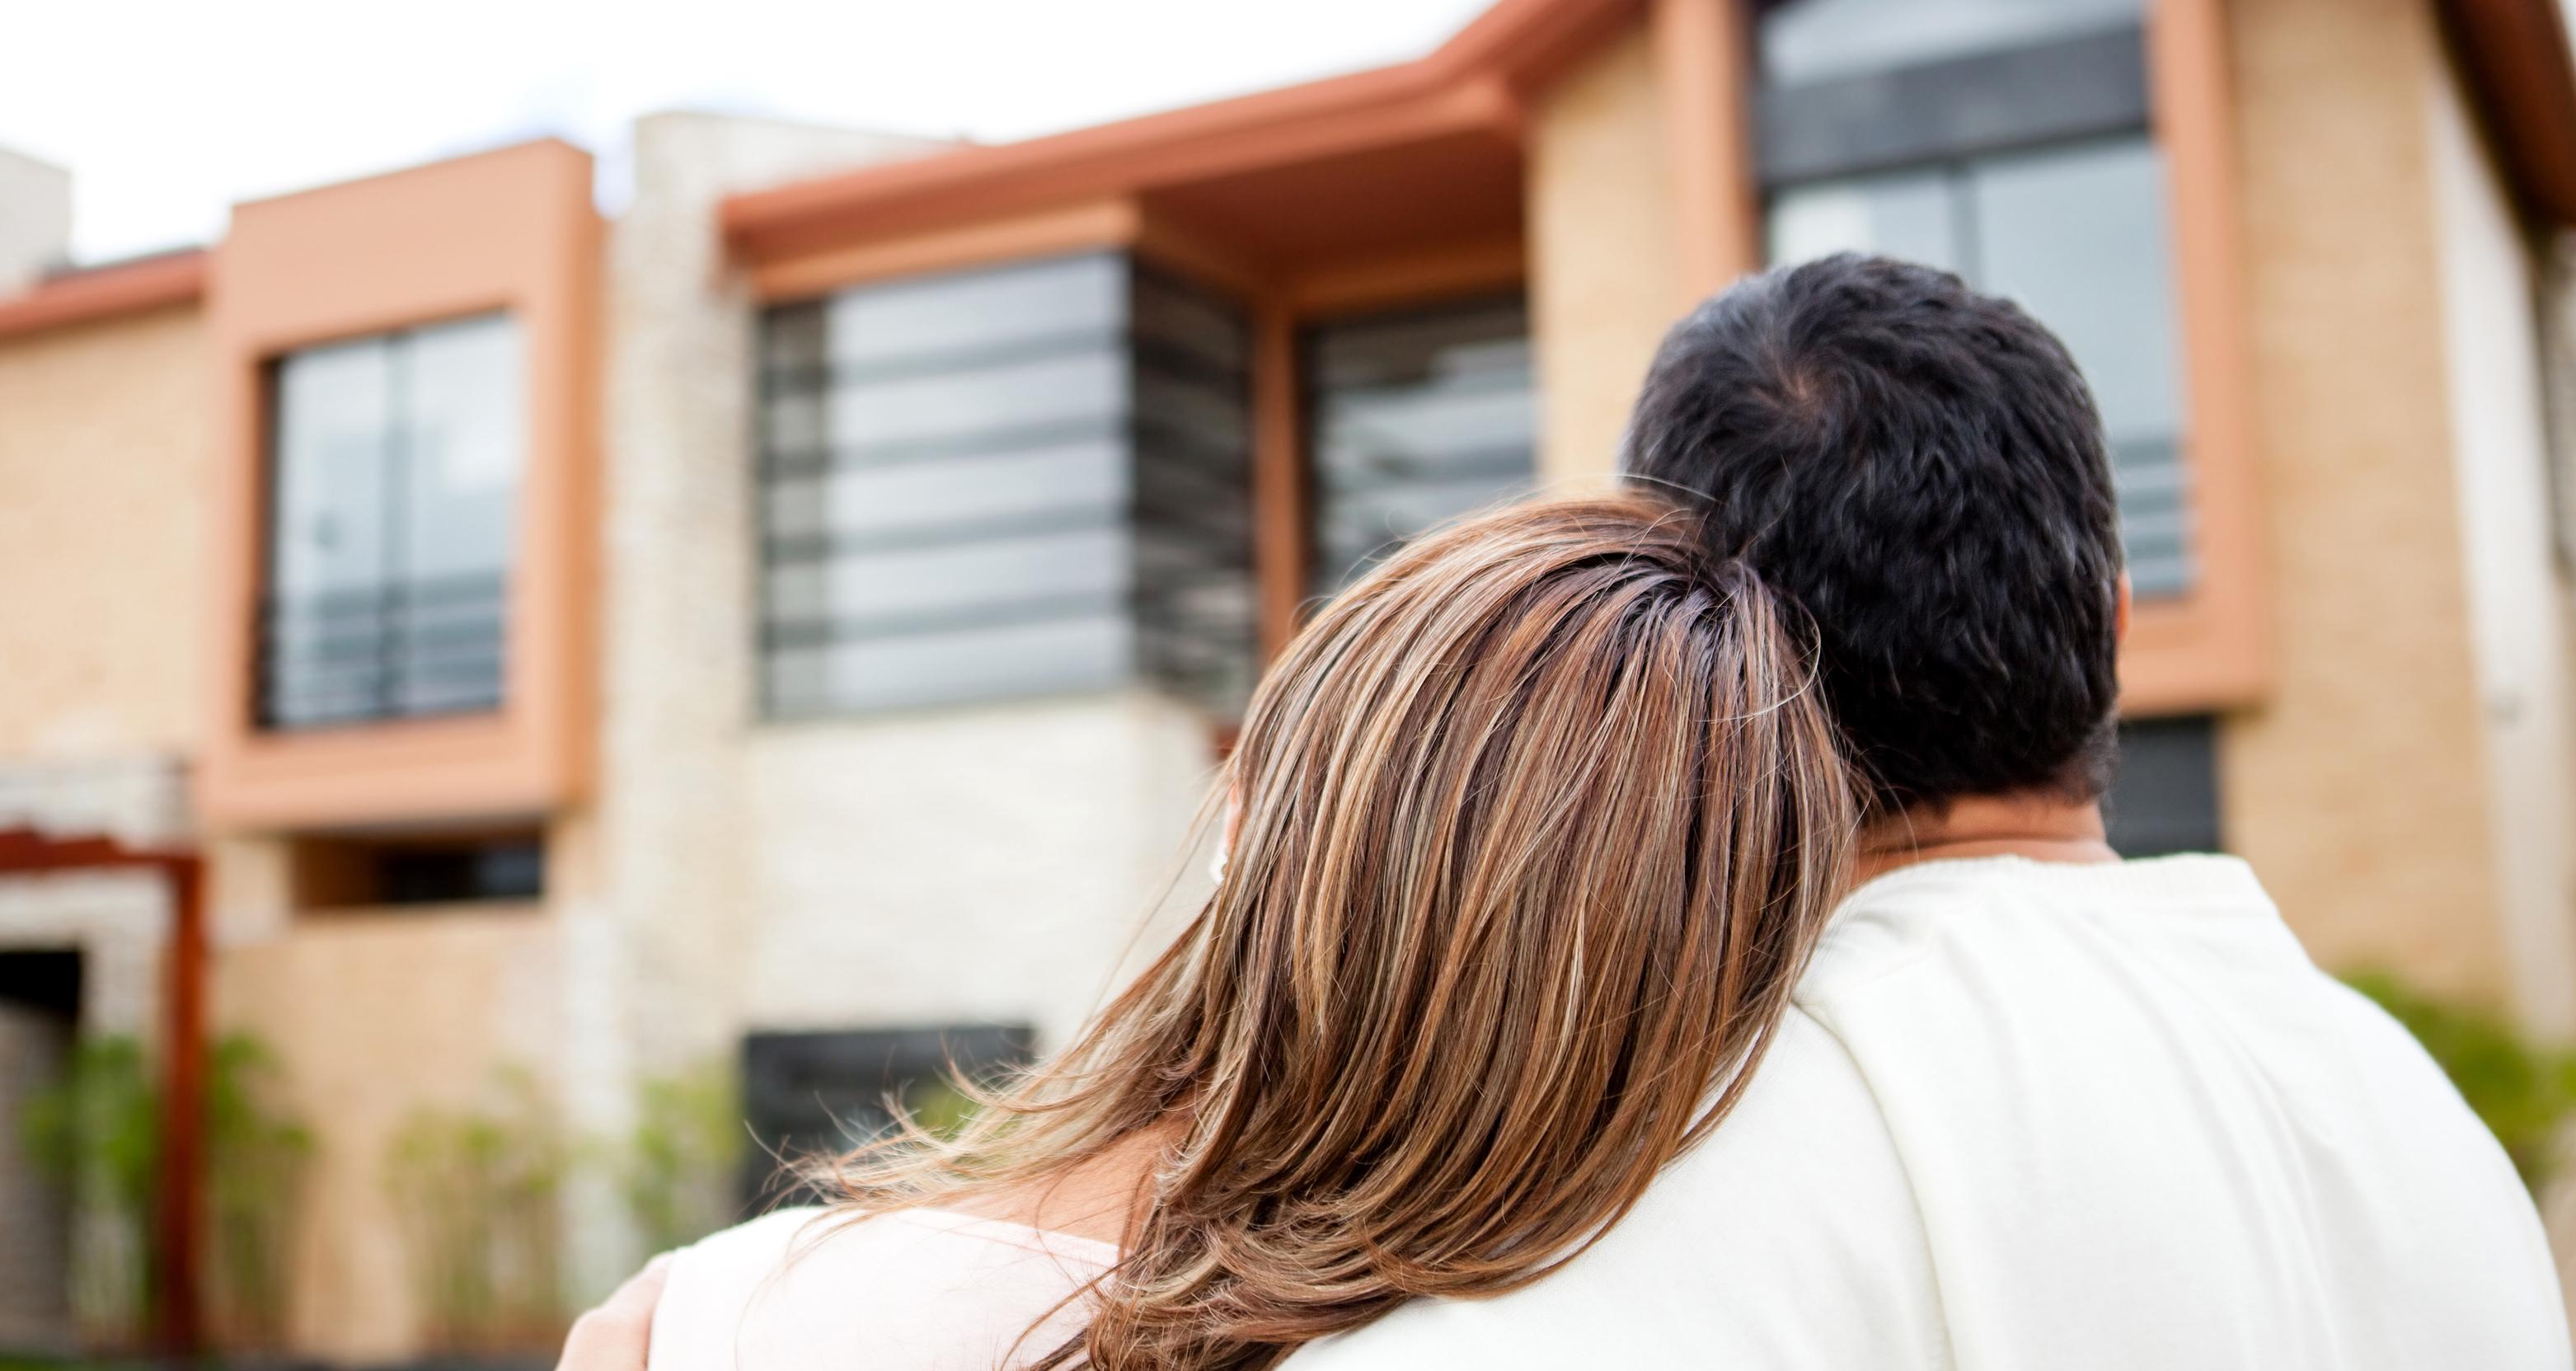 La casa del futuro: ecologica, performante, super comfy. 1